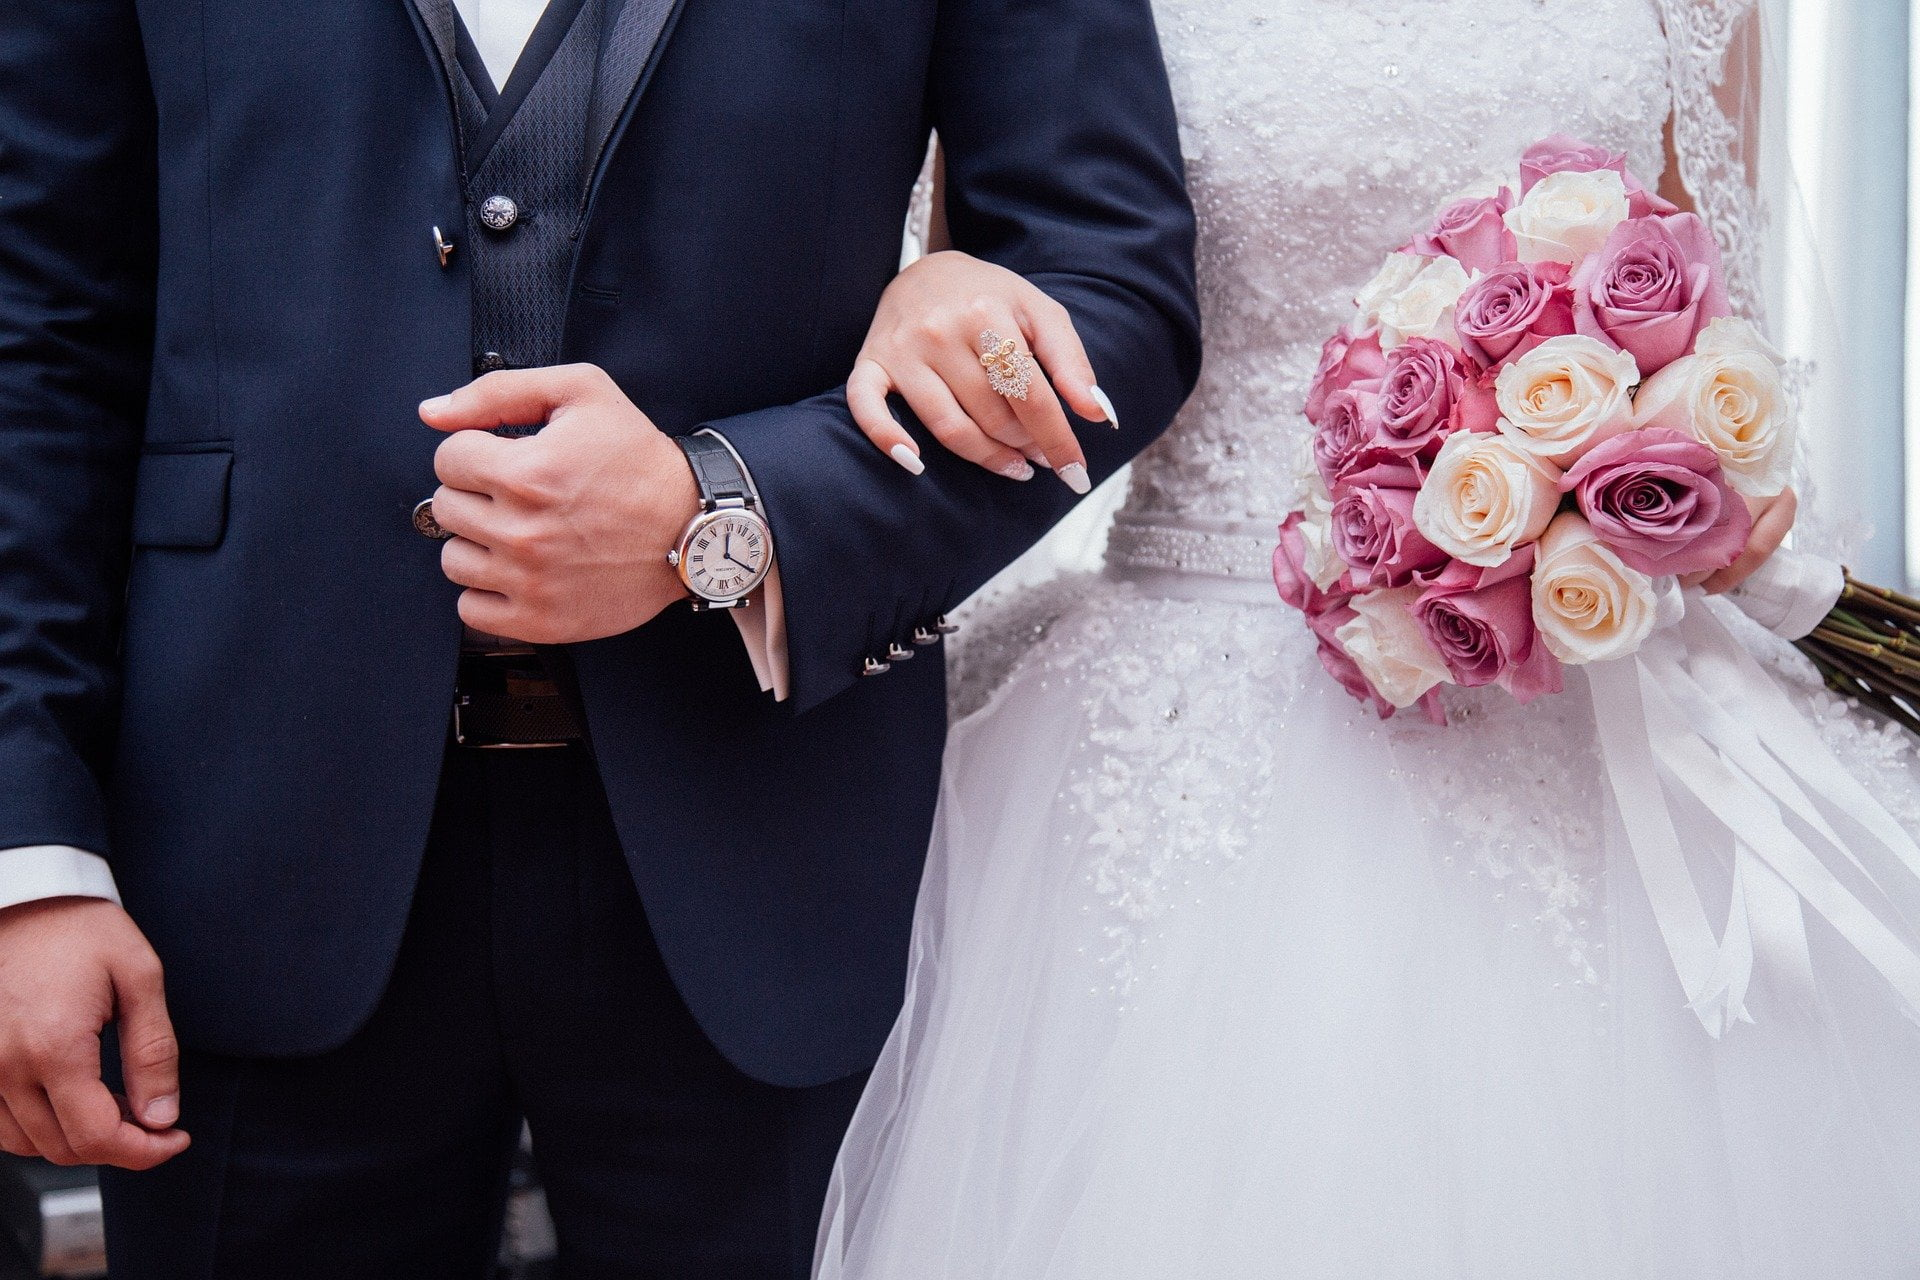 wedding-2595862_1920-94c60499